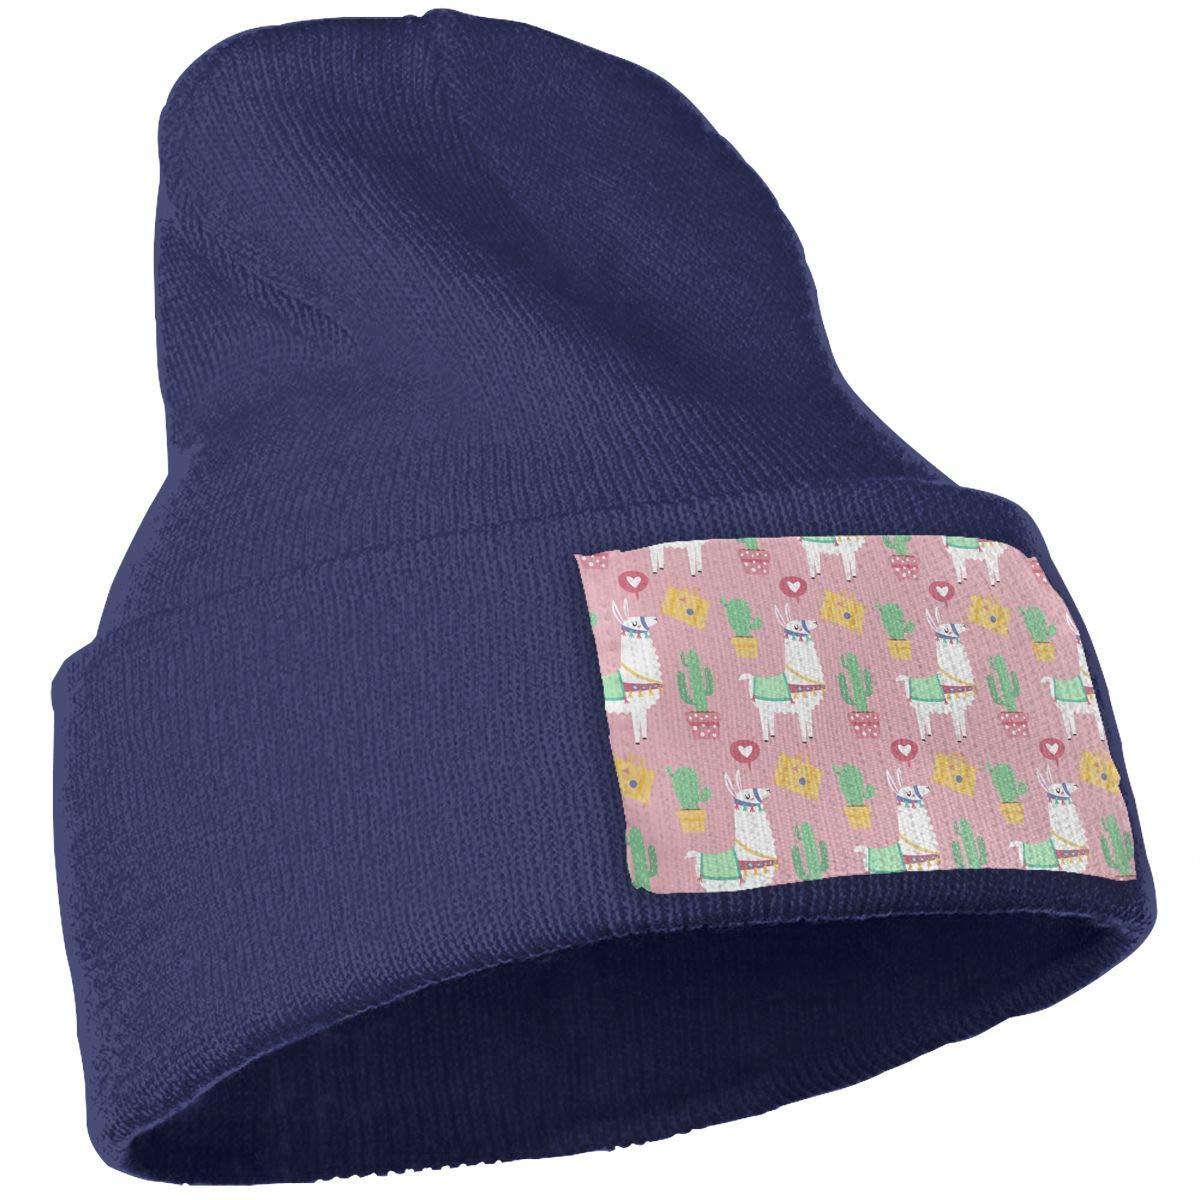 TAOMAP89 Alpaca Women and Men Skull Caps Winter Warm Stretchy Knit Beanie Hats